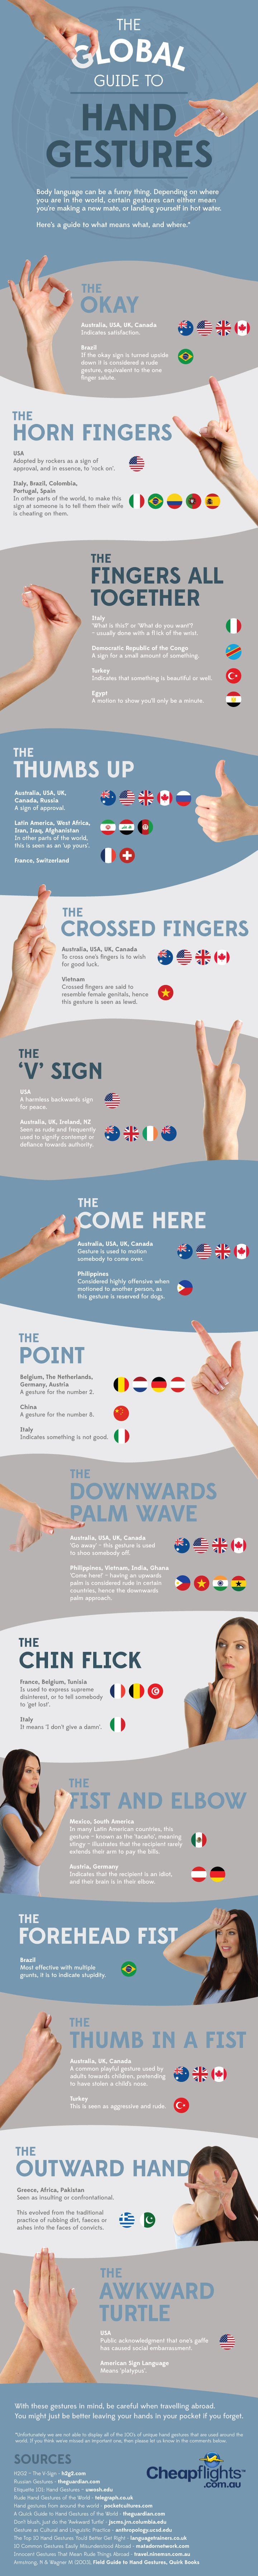 global-hand-gestures